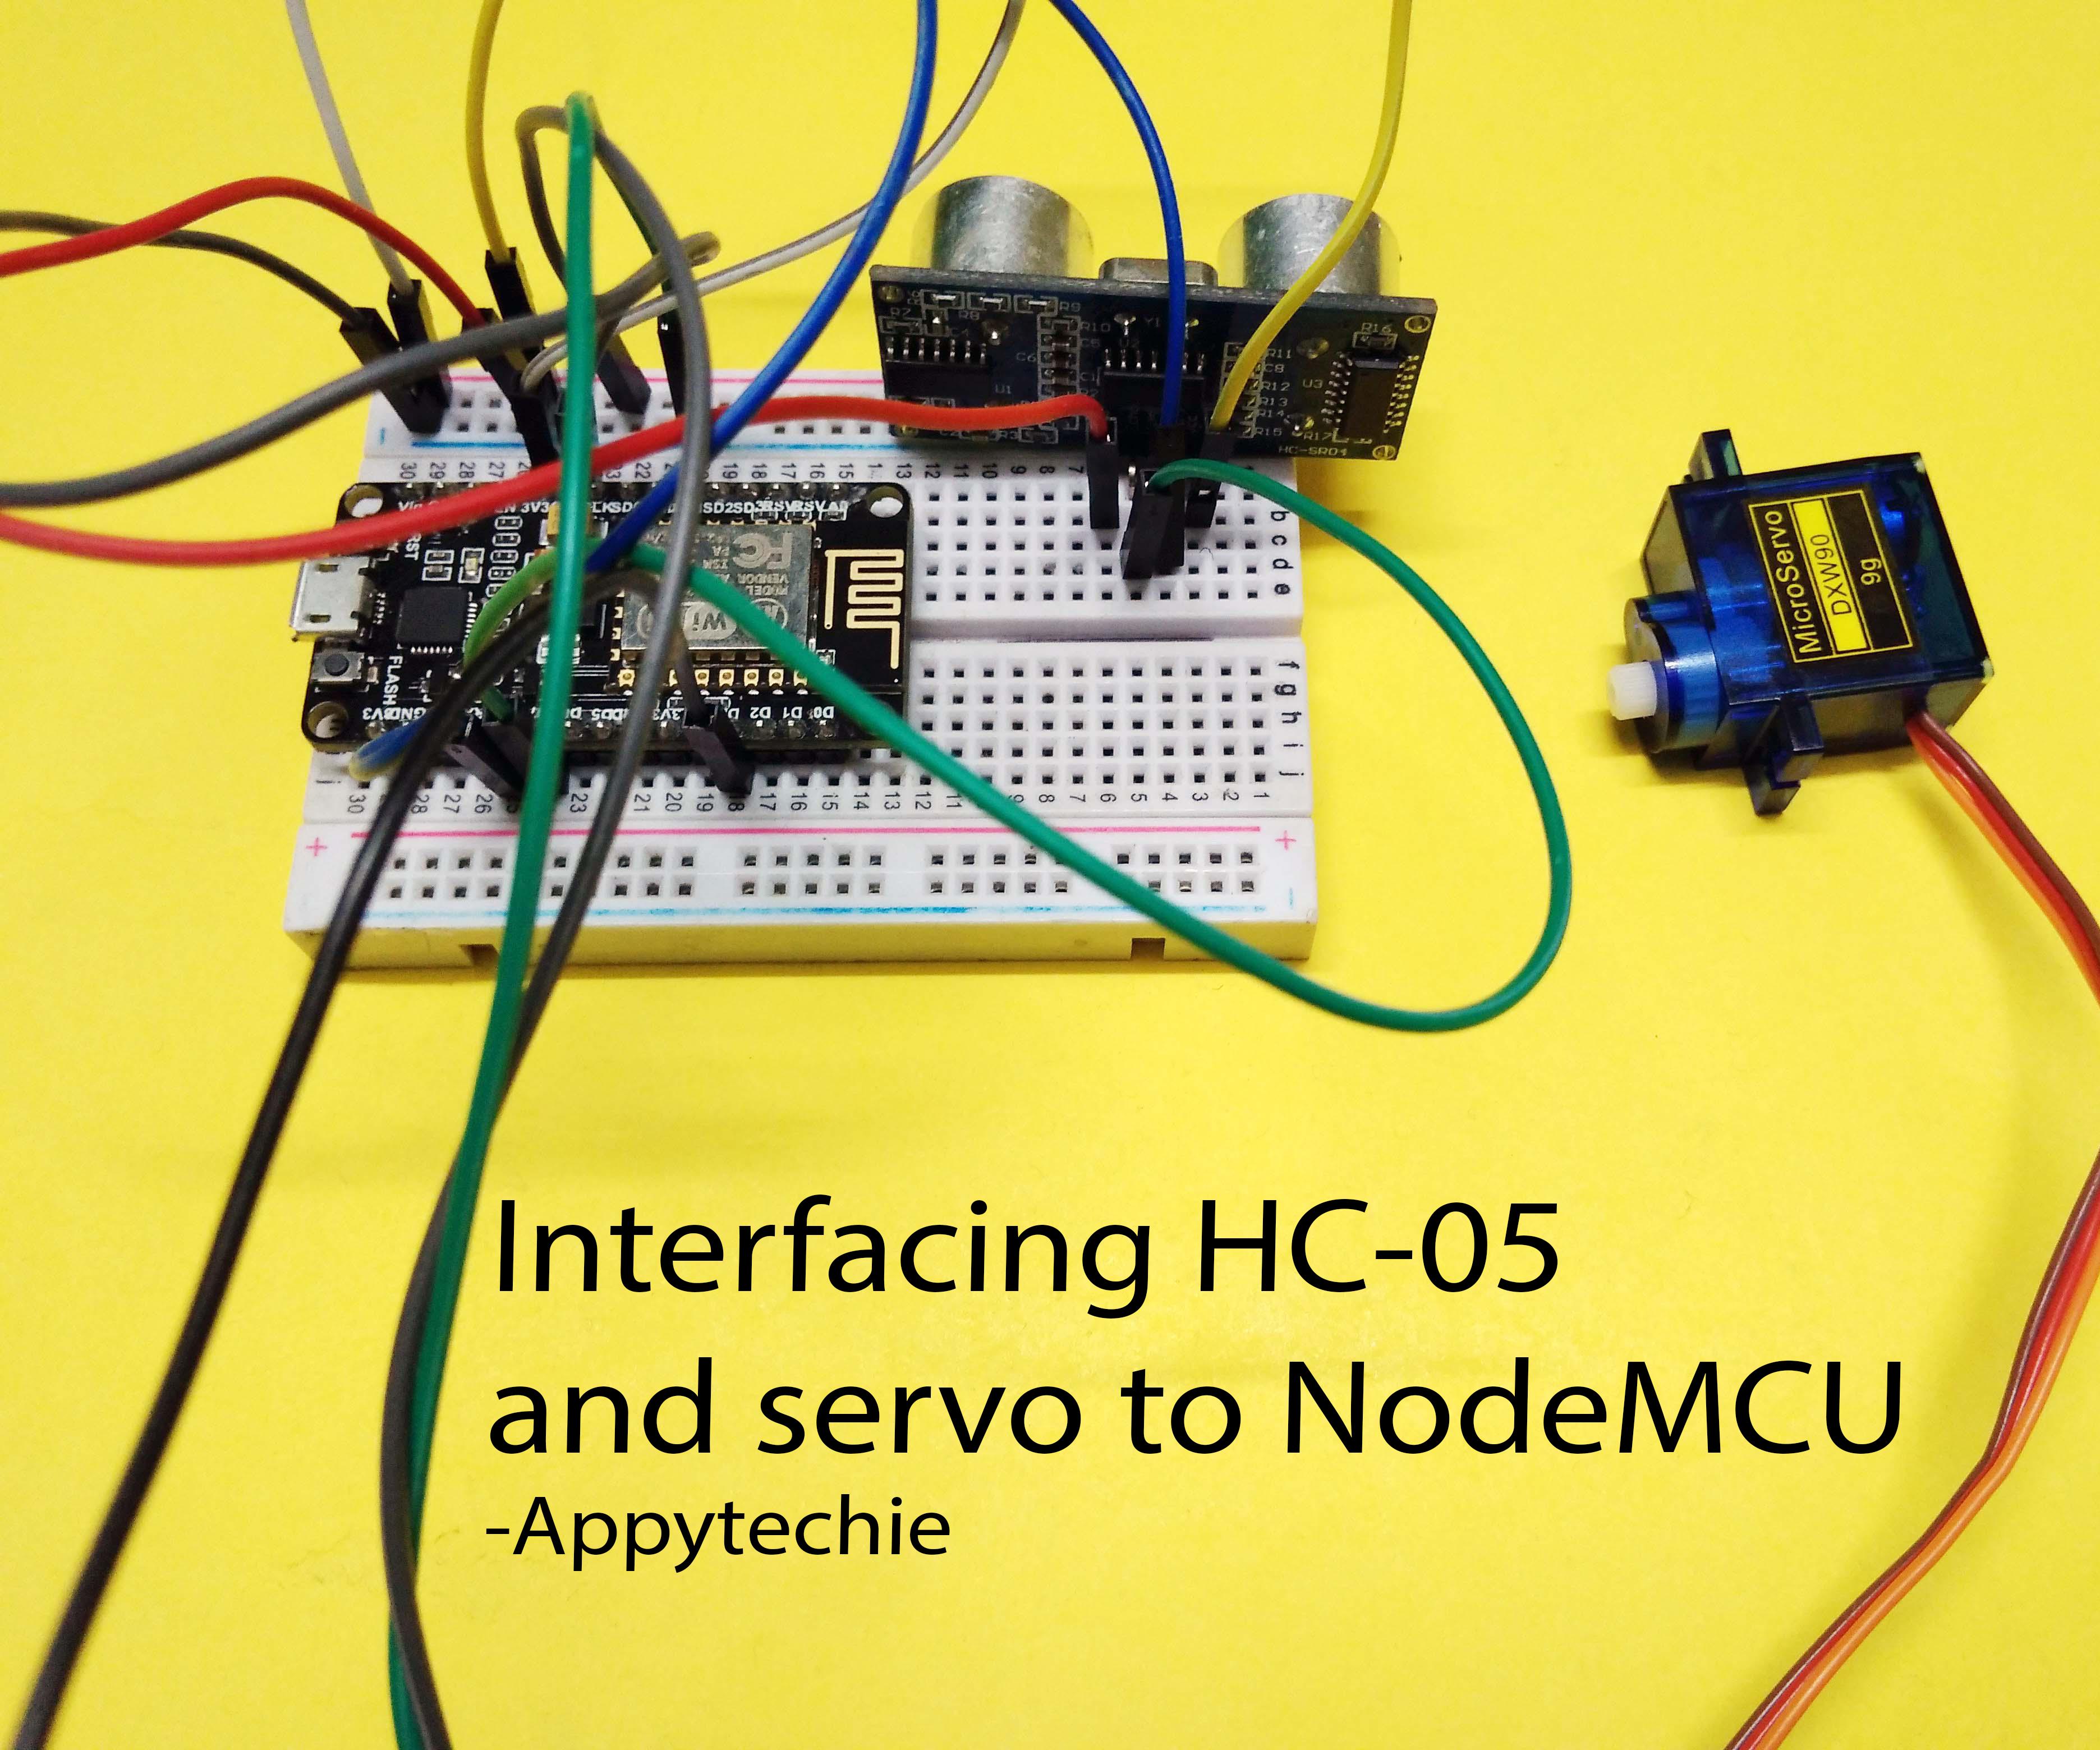 Ulttrasonic Sensor Controlled Servo in NodeMCU